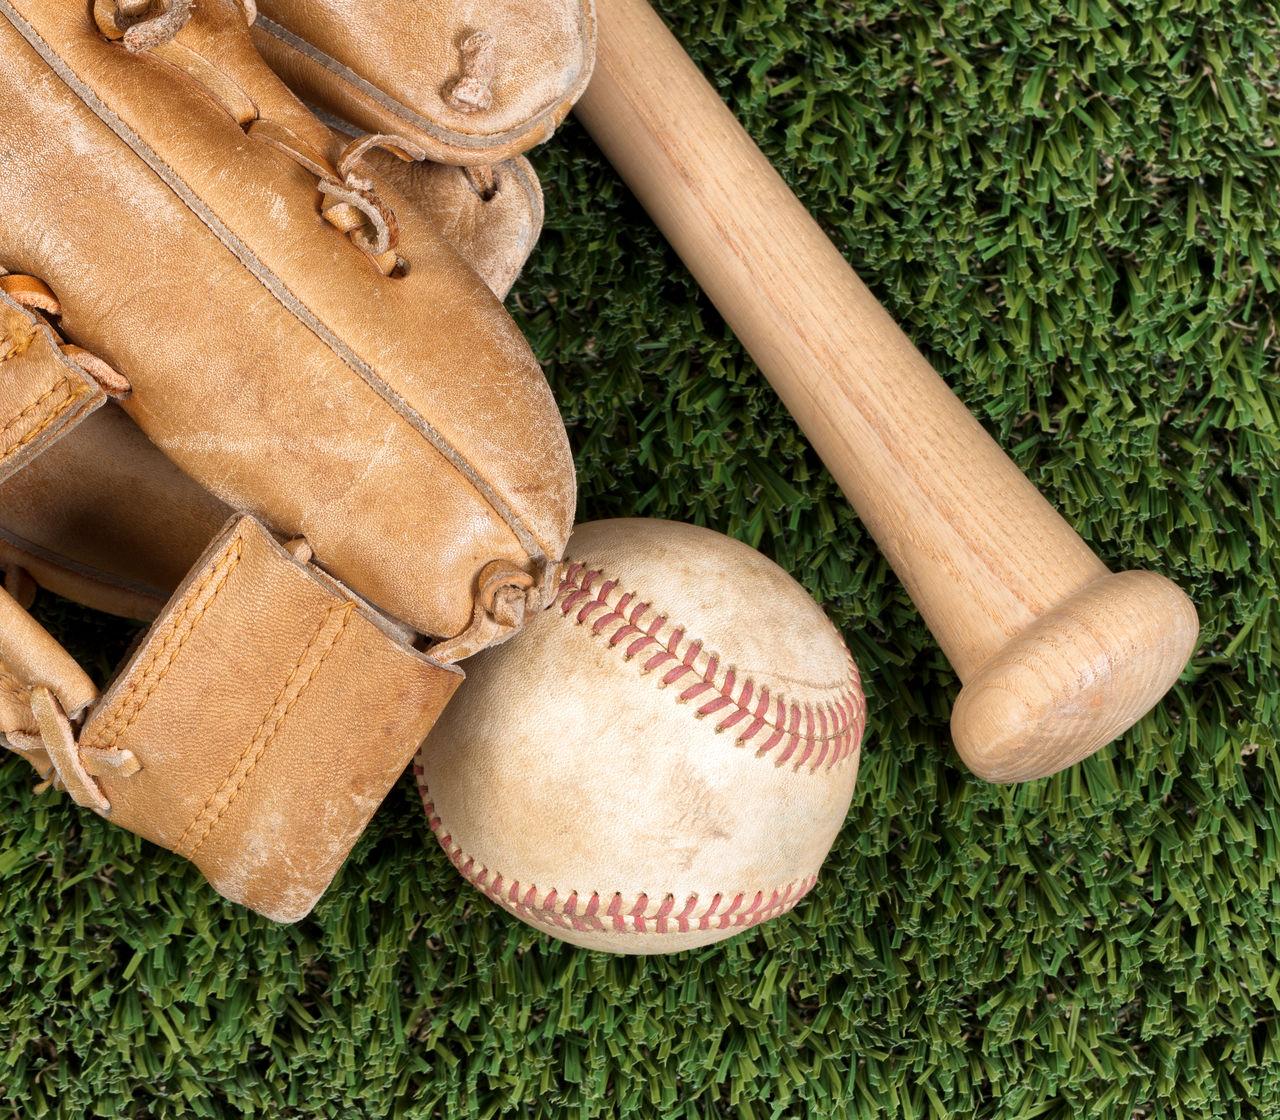 Close-Up Of Baseball Equipment On Grass